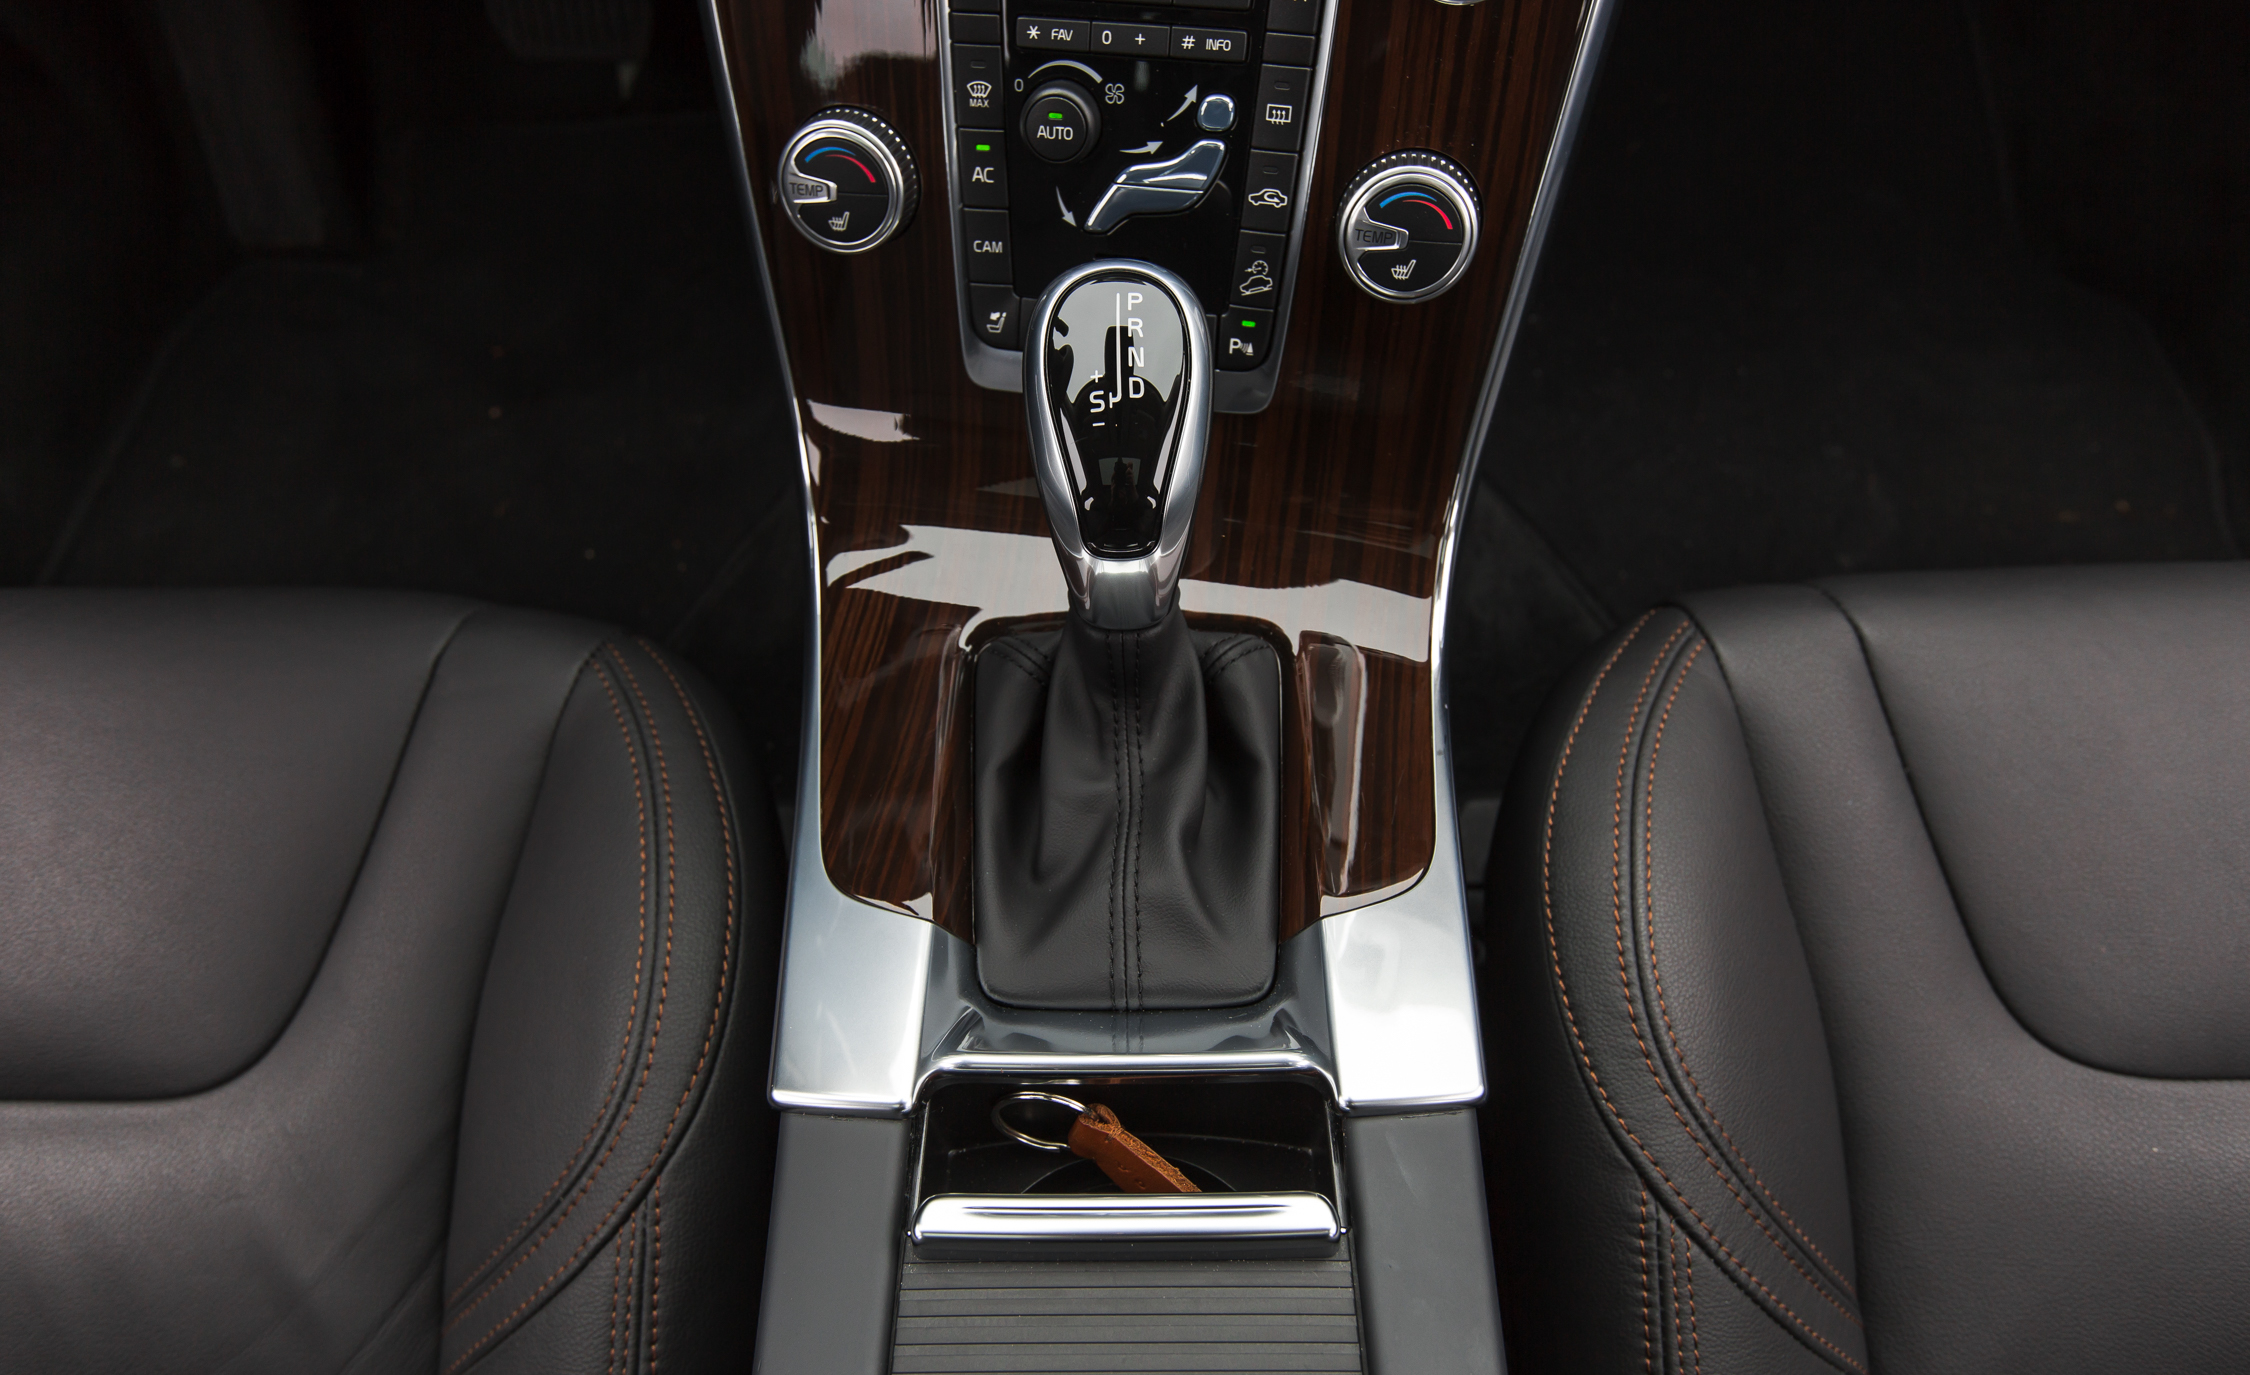 2016 Volvo S60 Cross Country Interior Gear Shift Knob